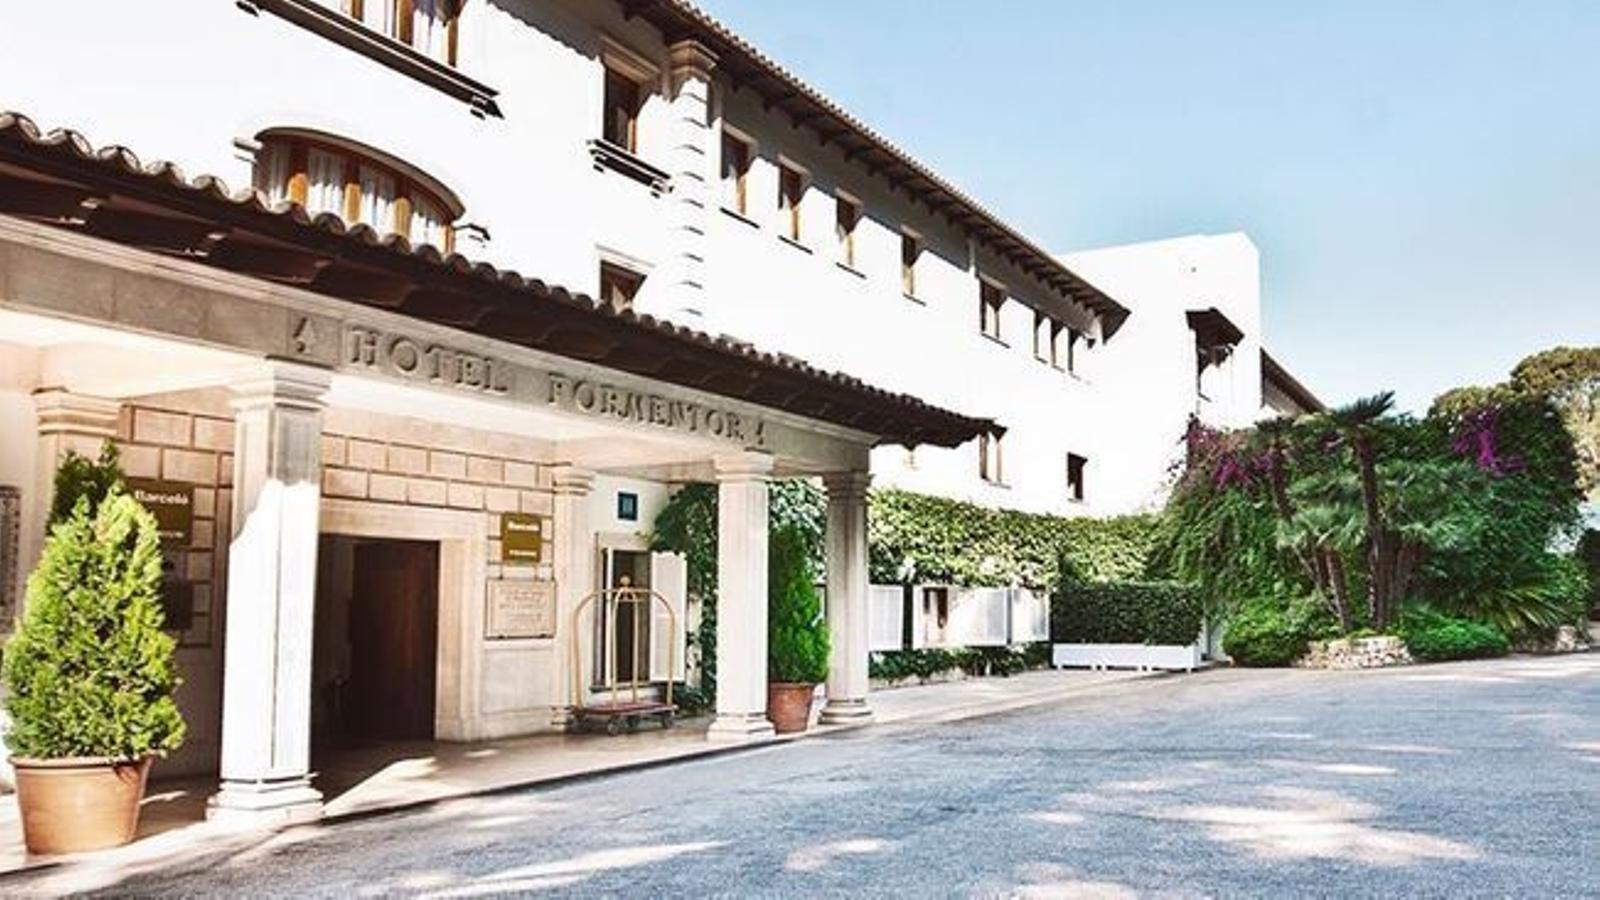 L'Hotel Formentor